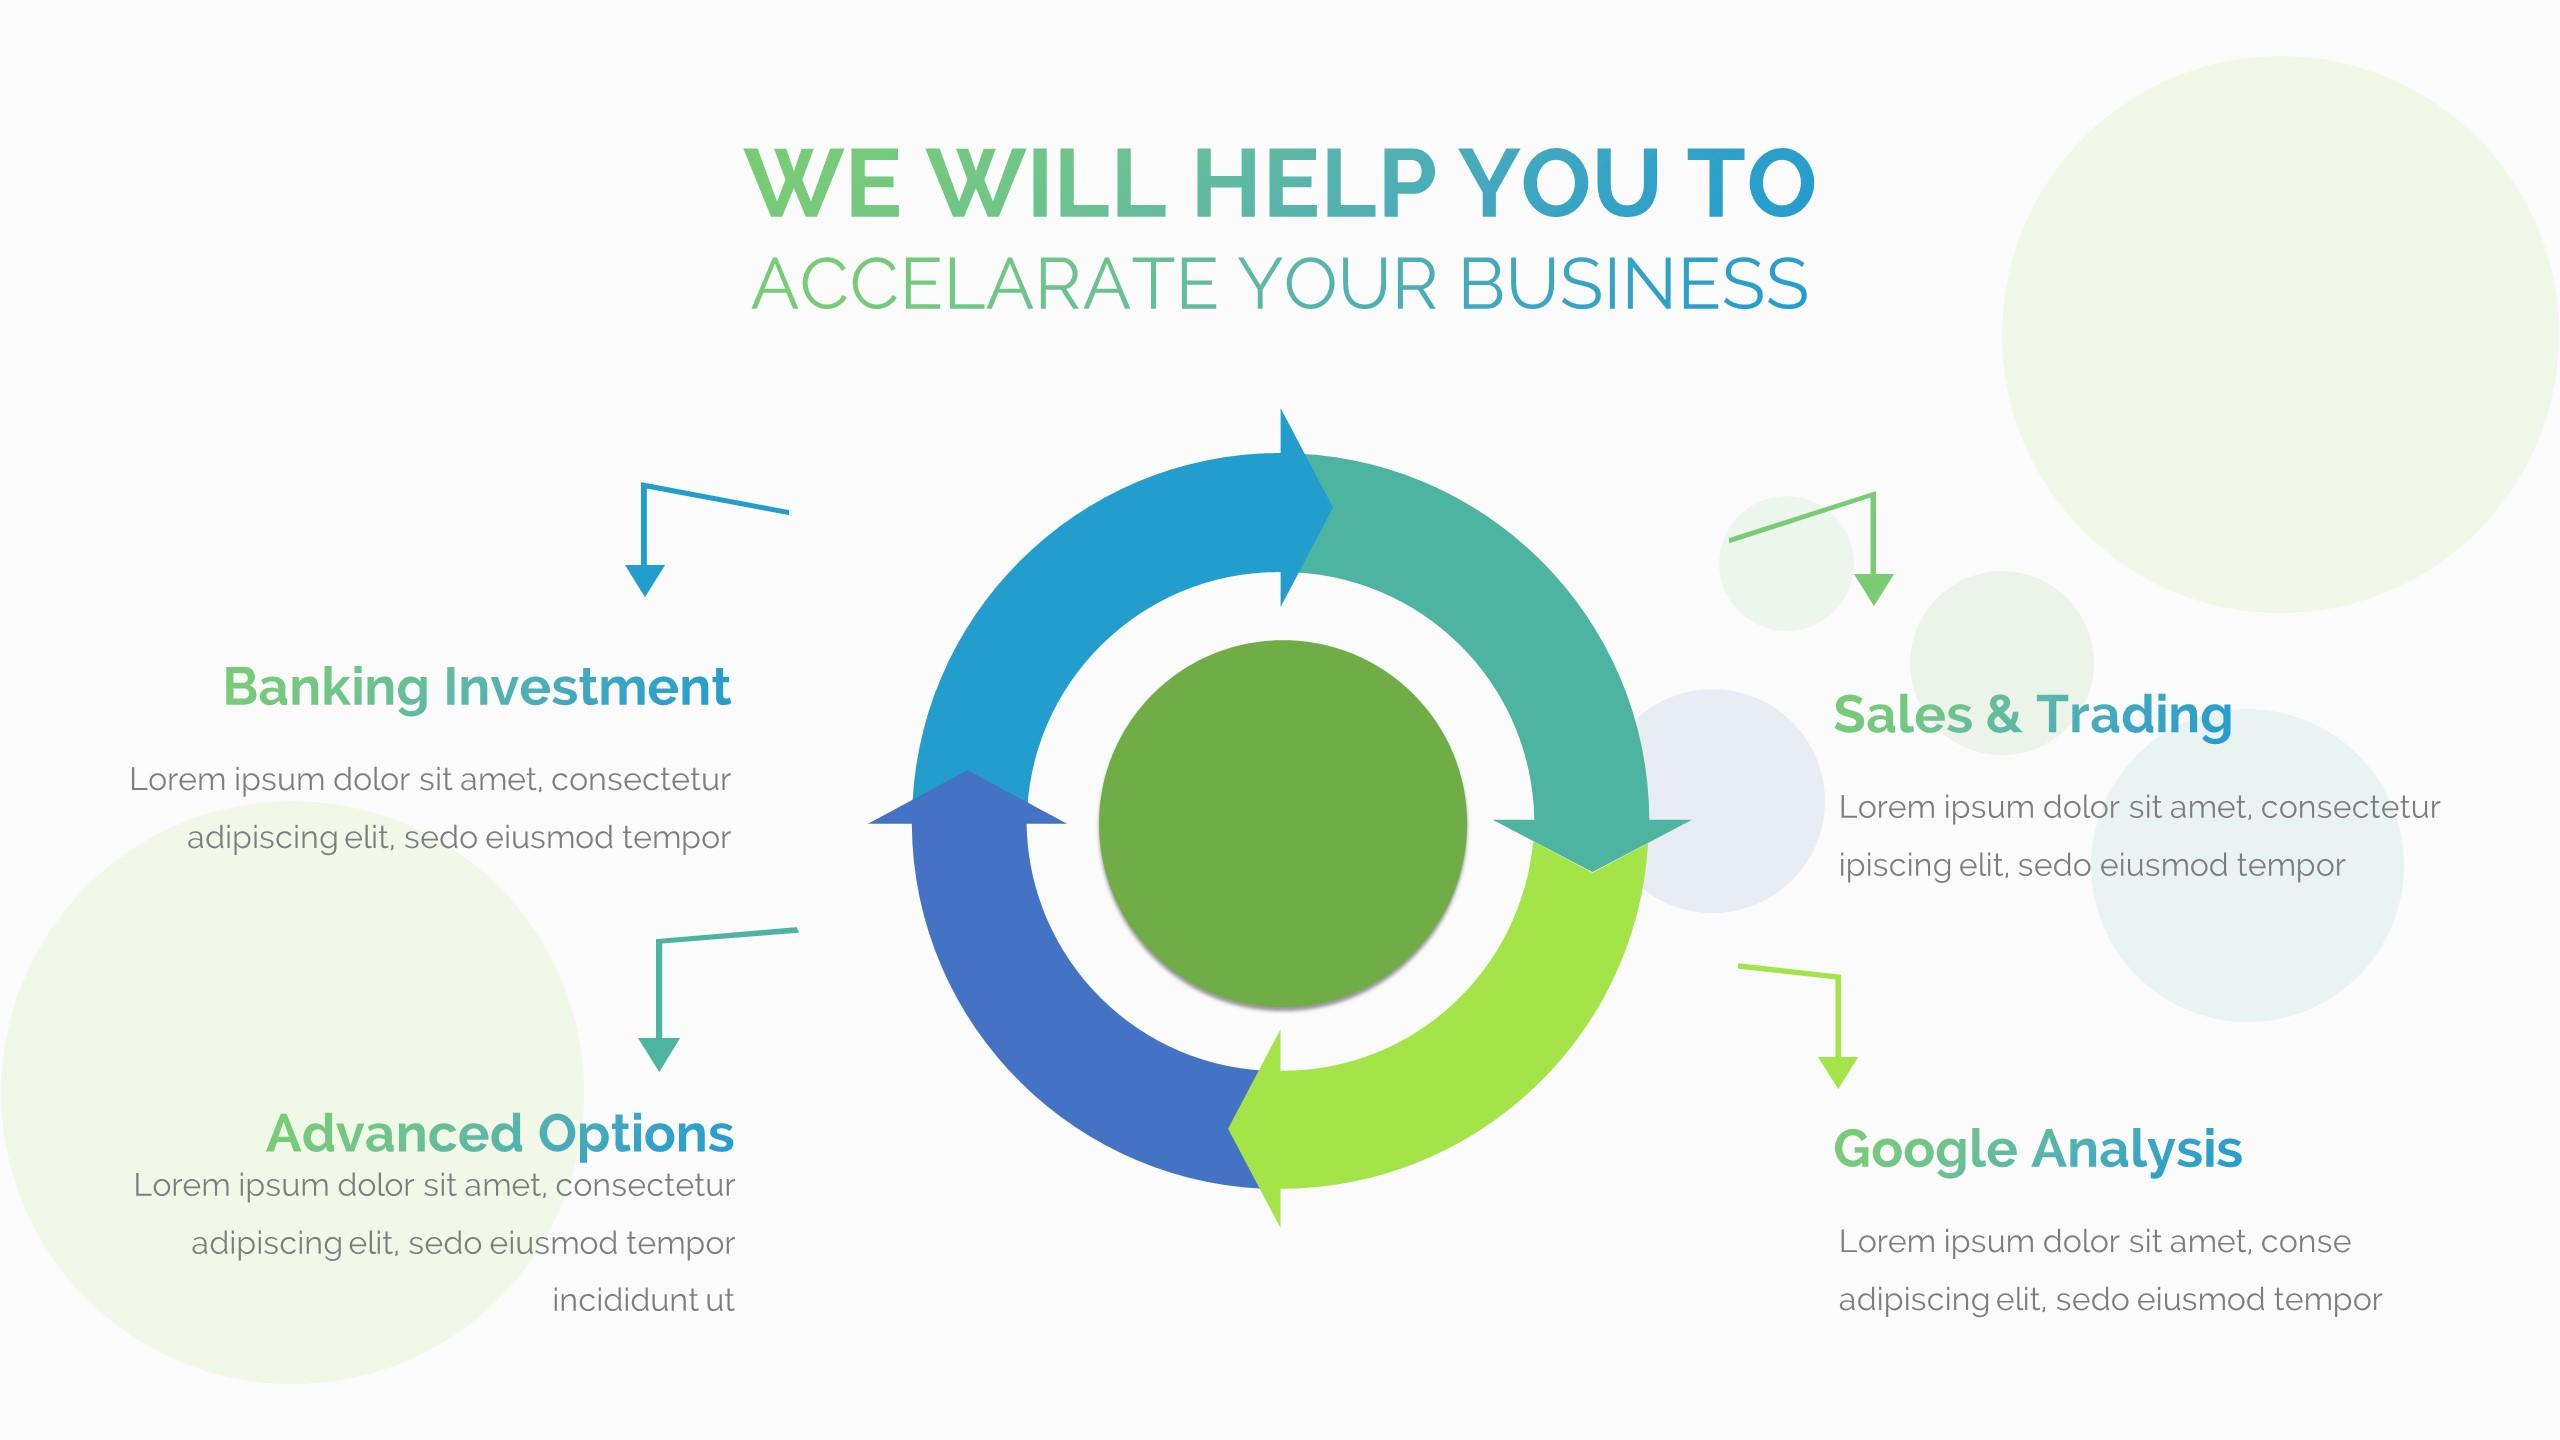 3 in 1 Business - Jun 14 Premium Bundle Powerpoint Template by ...